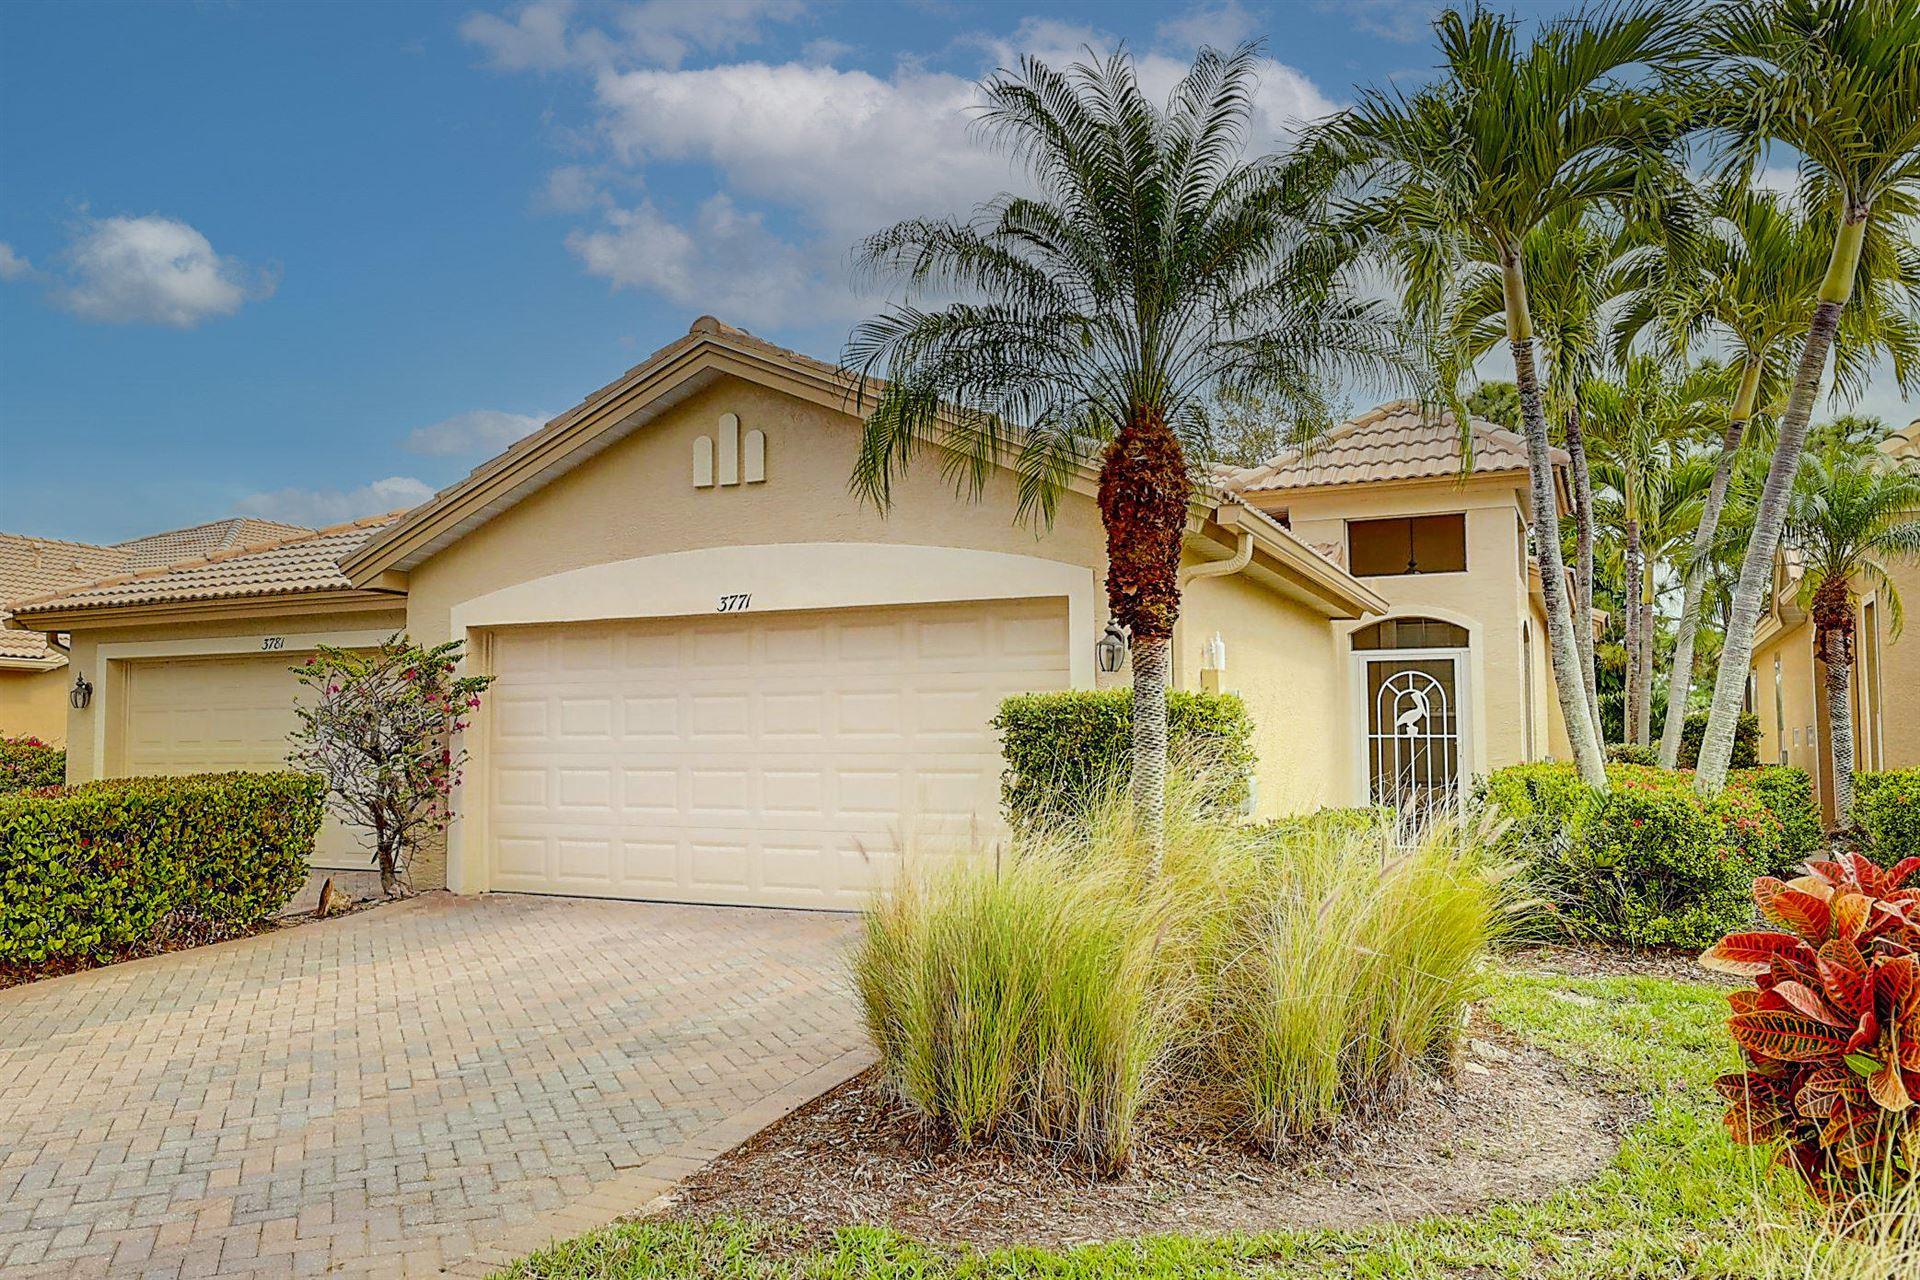 3771 NW Willow Creek Drive, Jensen Beach, FL 34957 - #: RX-10697554